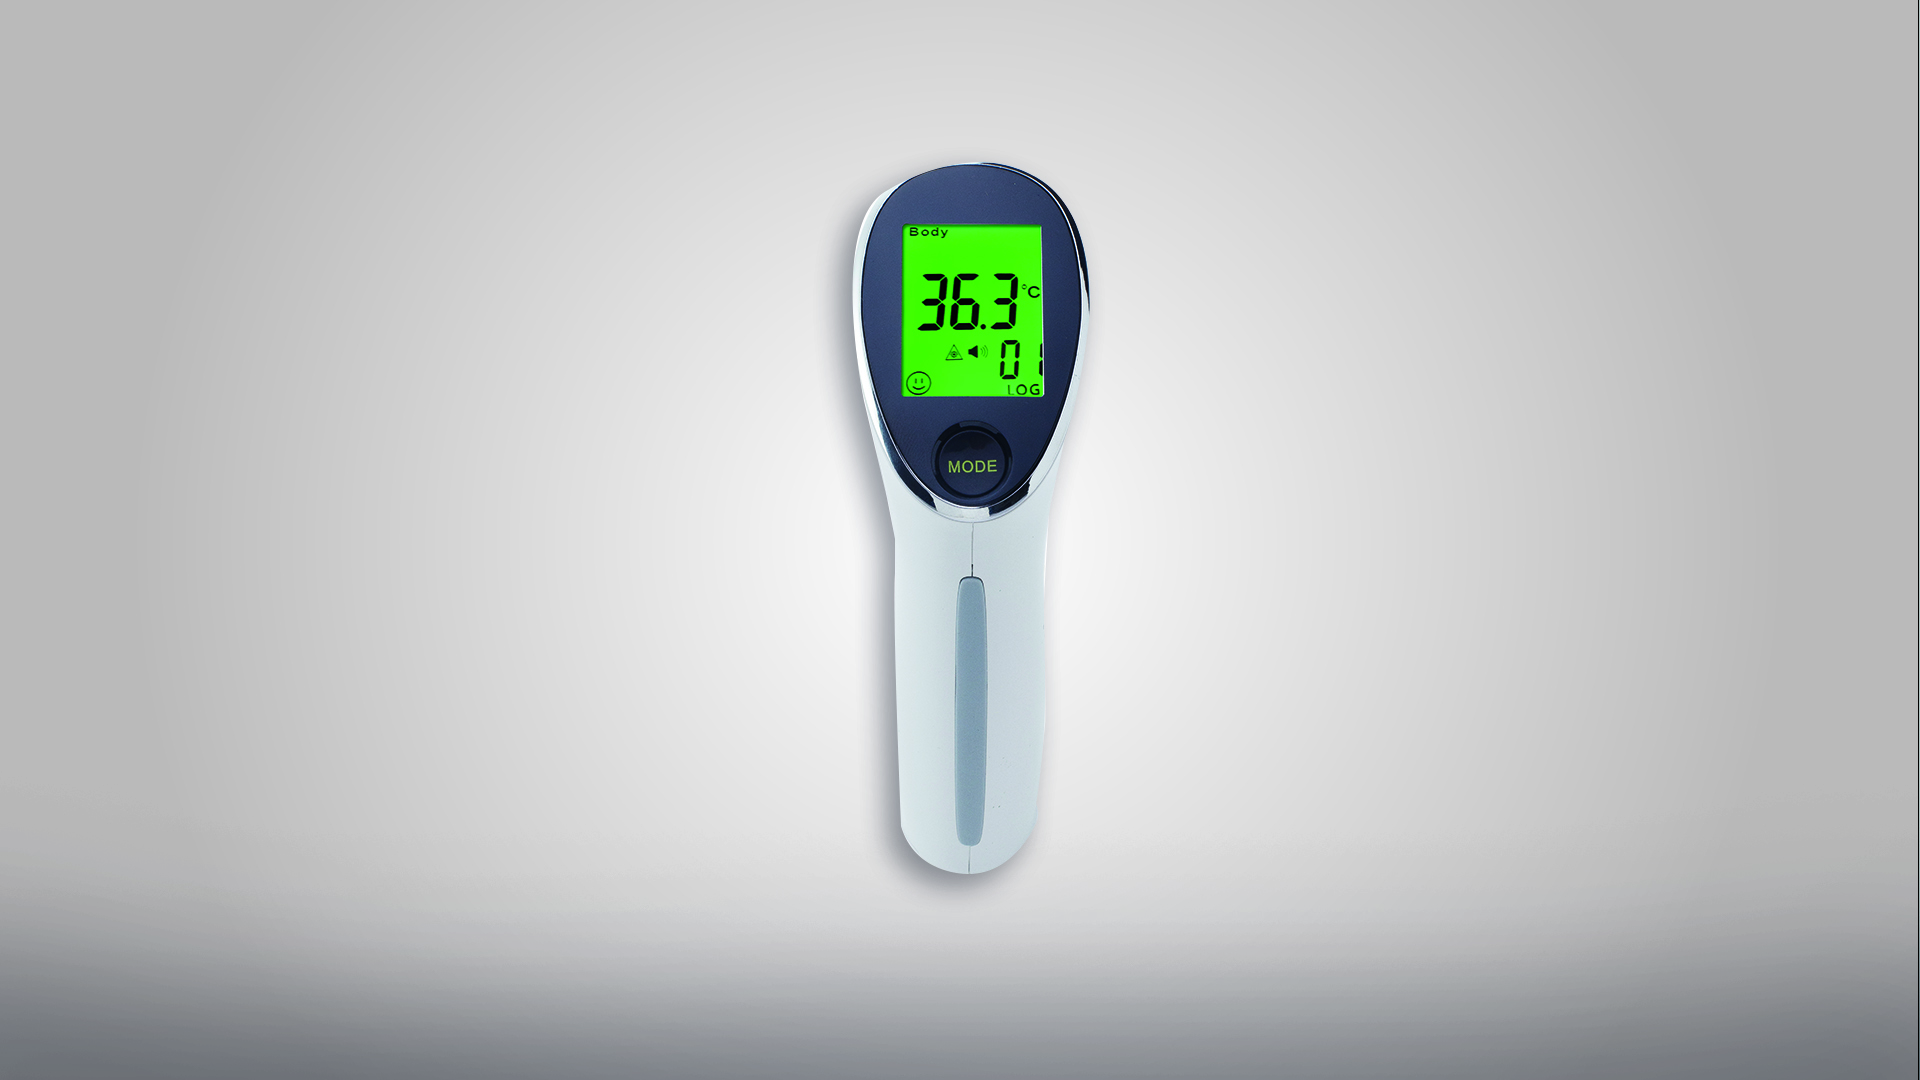 Termometro A Infrarossi Yk Irt2 Amiitalia 100+ vectors, stock photos & psd files. termometro a infrarossi yk irt2 amiitalia